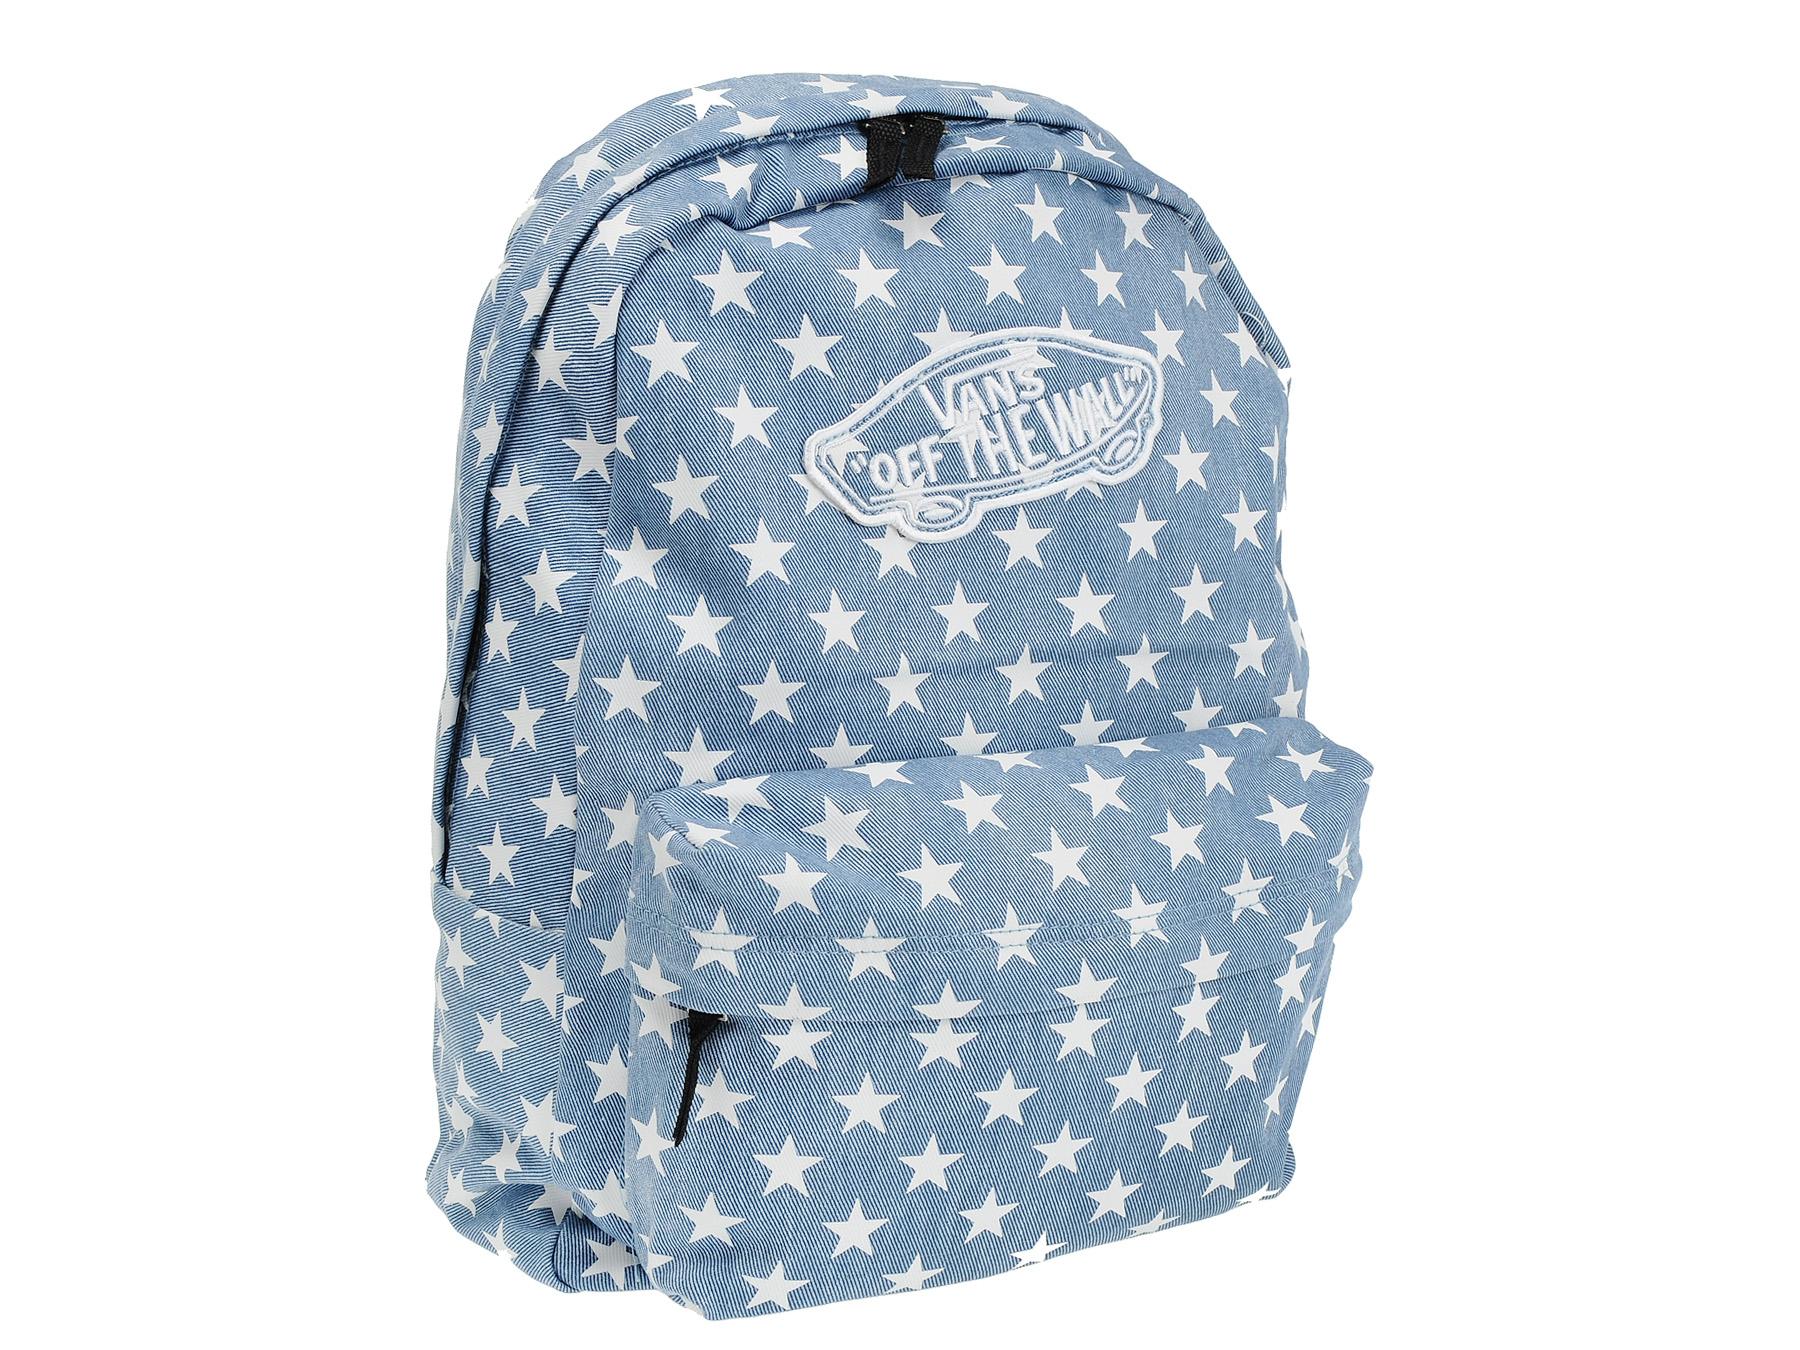 d4009f27efb52 Plecak Vans Gwiazdki Denim Realm Backpack VNZ07XJ - 7033699754 ...